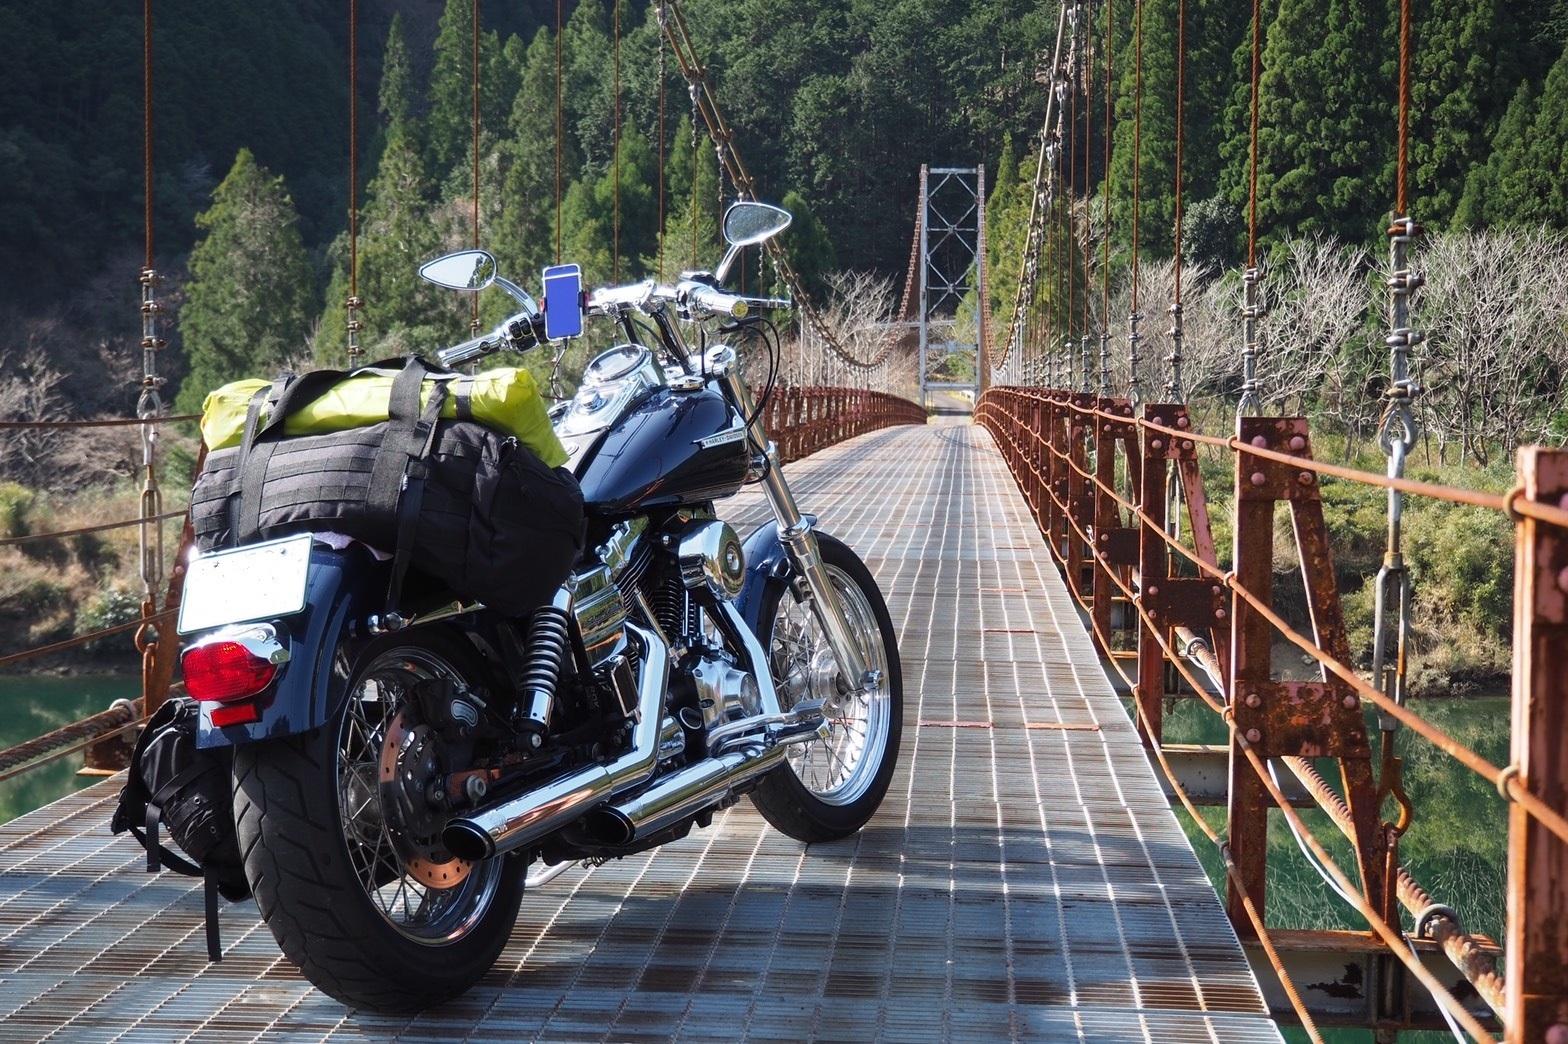 harleydavidson-motorcycle-touring-blog-wakayama-okutoro-campsite-suspensionbridge-2.jpg